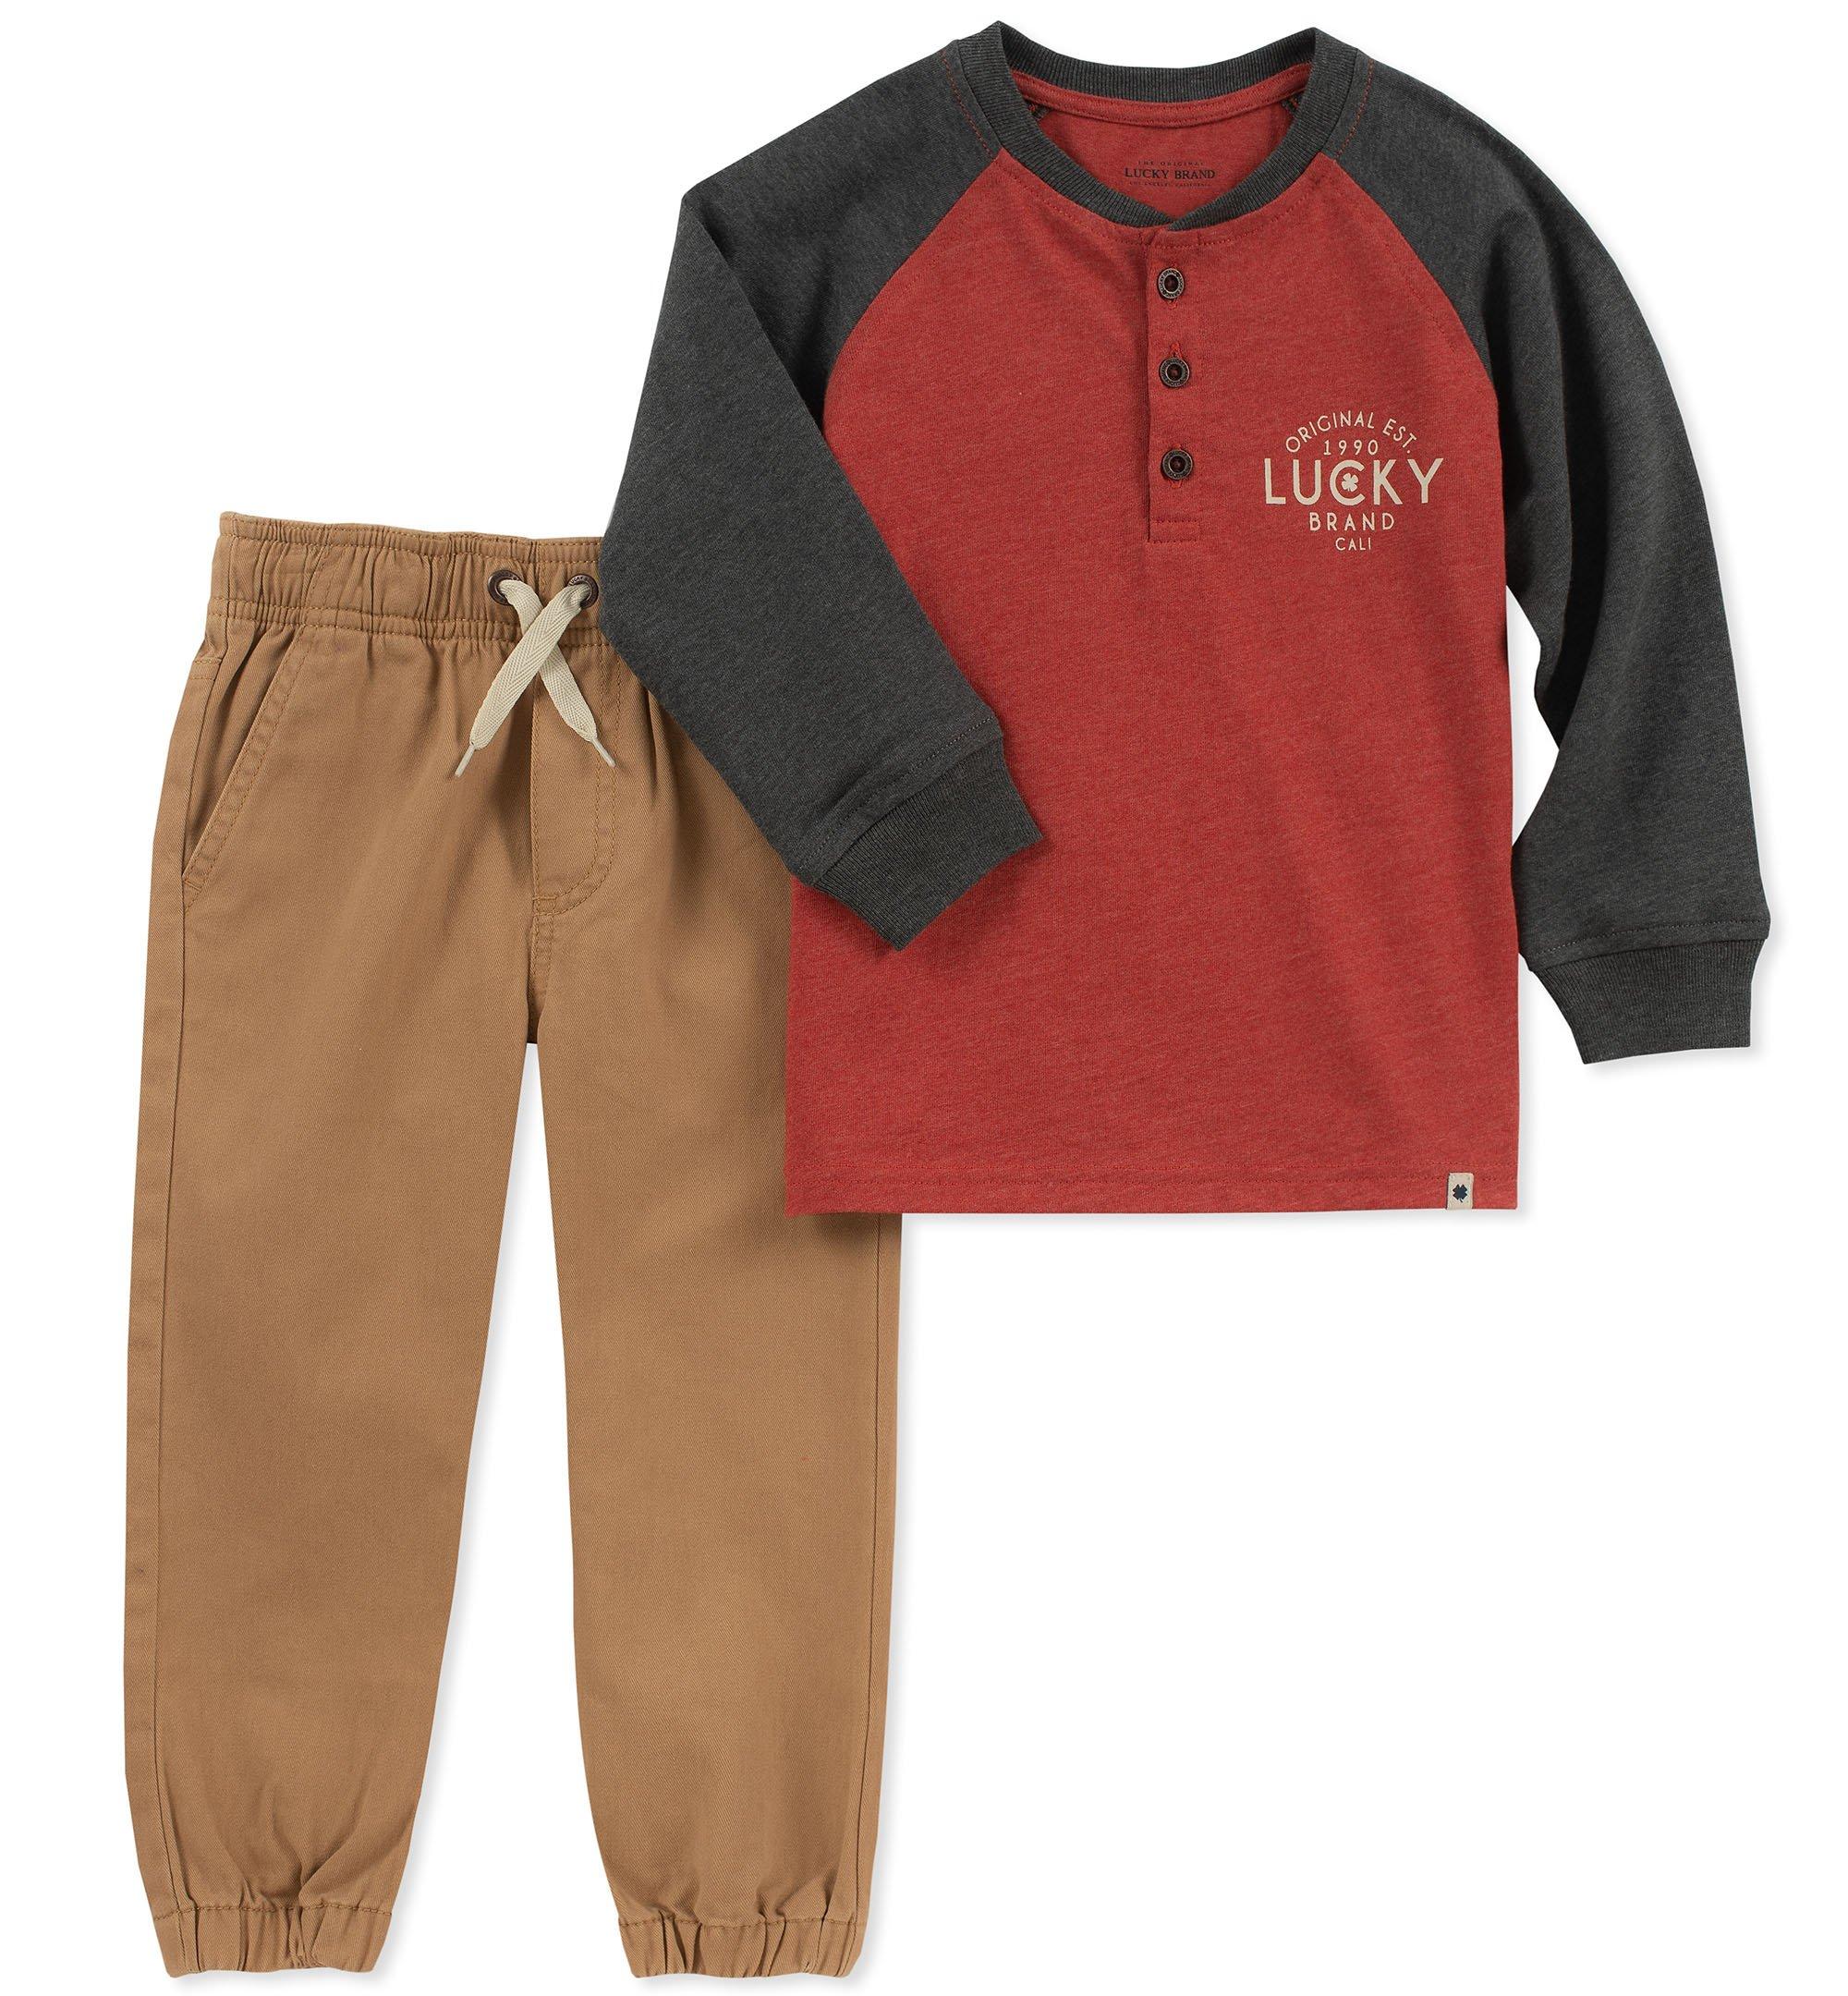 Lucky Sets Boys' Little 2 Pieces Pant Set, Charcoal/red/Khaki, 7